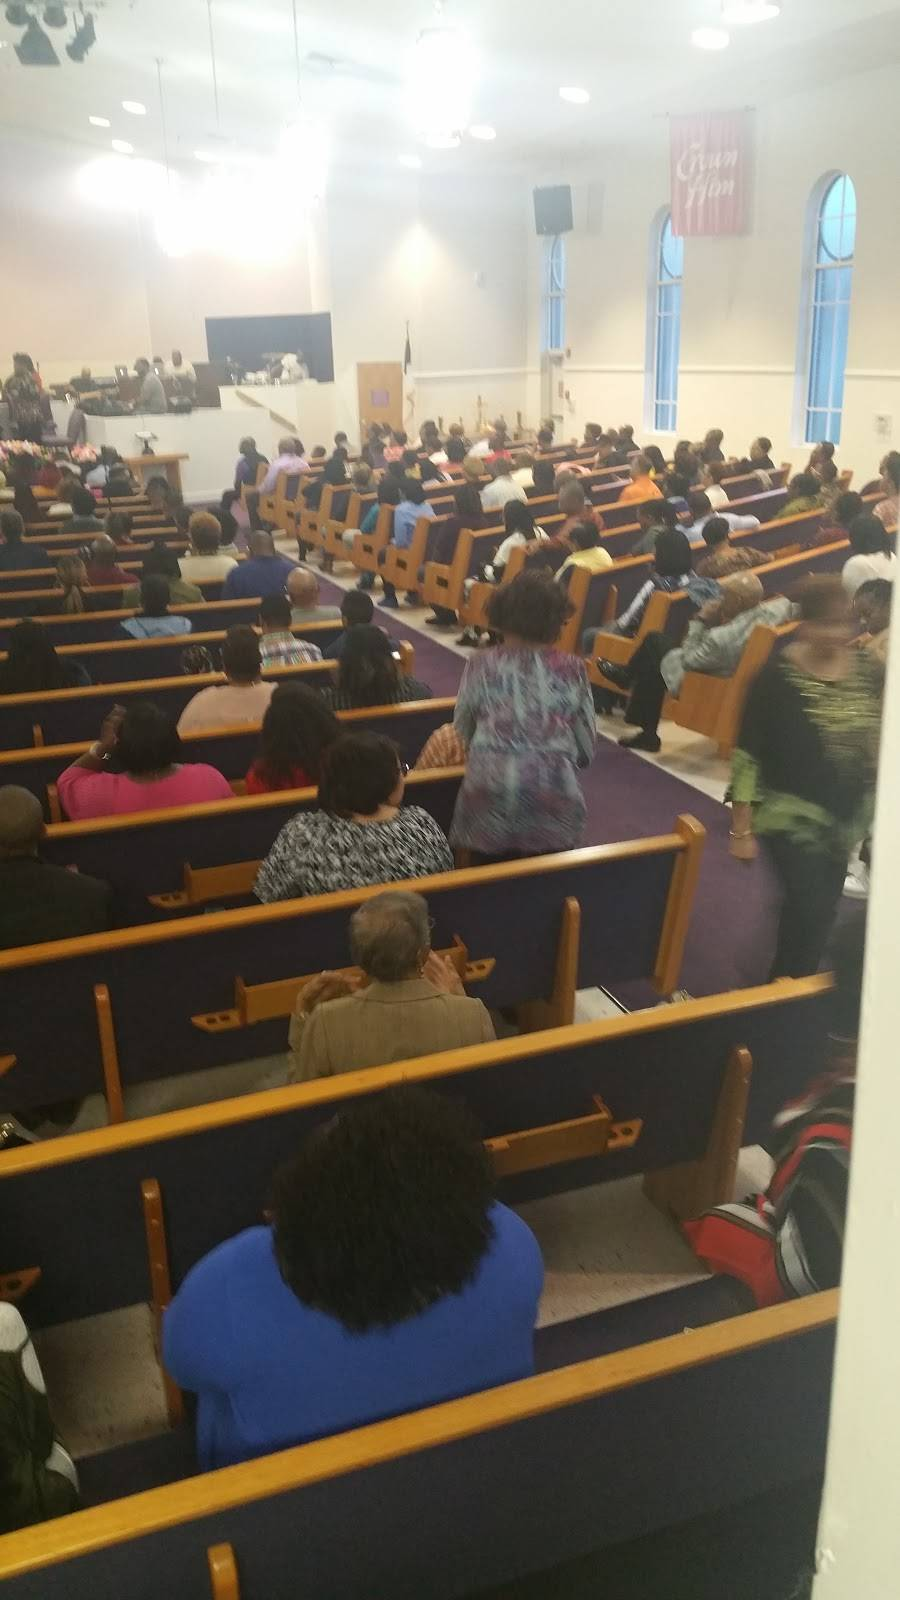 Mount Lebanon Baptist Church - church  | Photo 4 of 8 | Address: 884 Bells Mill Rd, Chesapeake, VA 23322, USA | Phone: (757) 547-3388